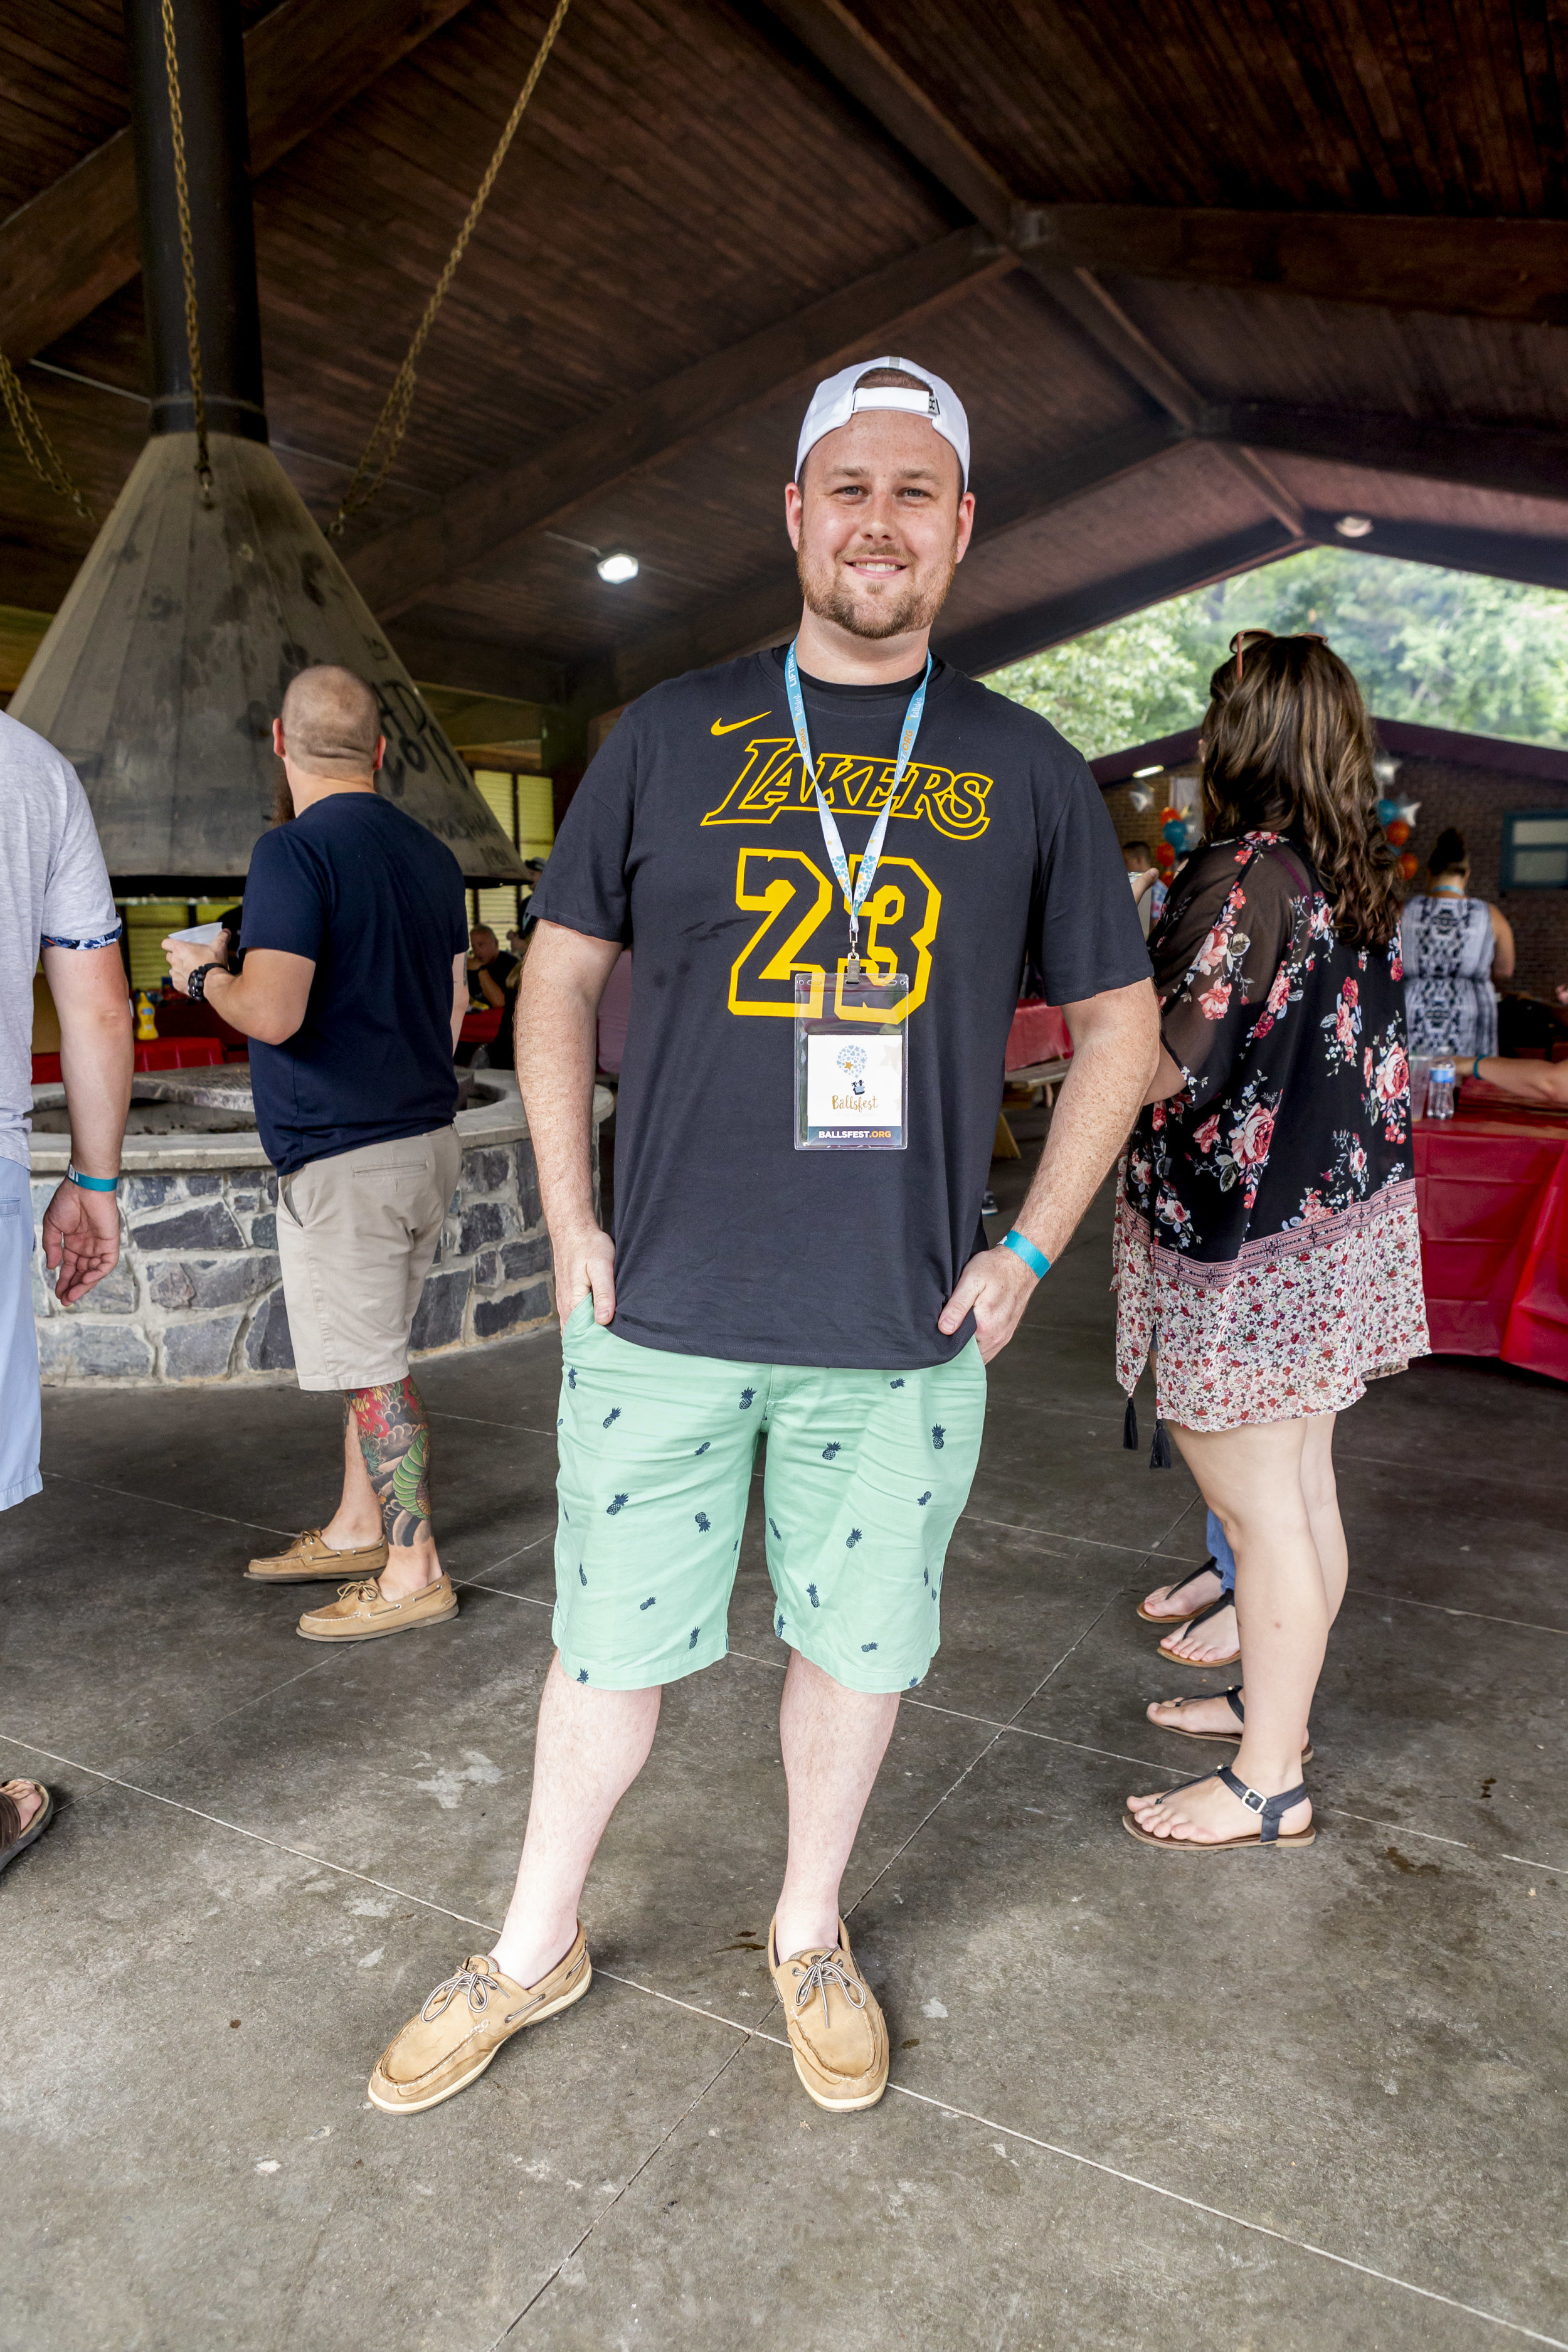 (2018.07.14) Ballsfest Saratoga Spa State Park-3561.jpg